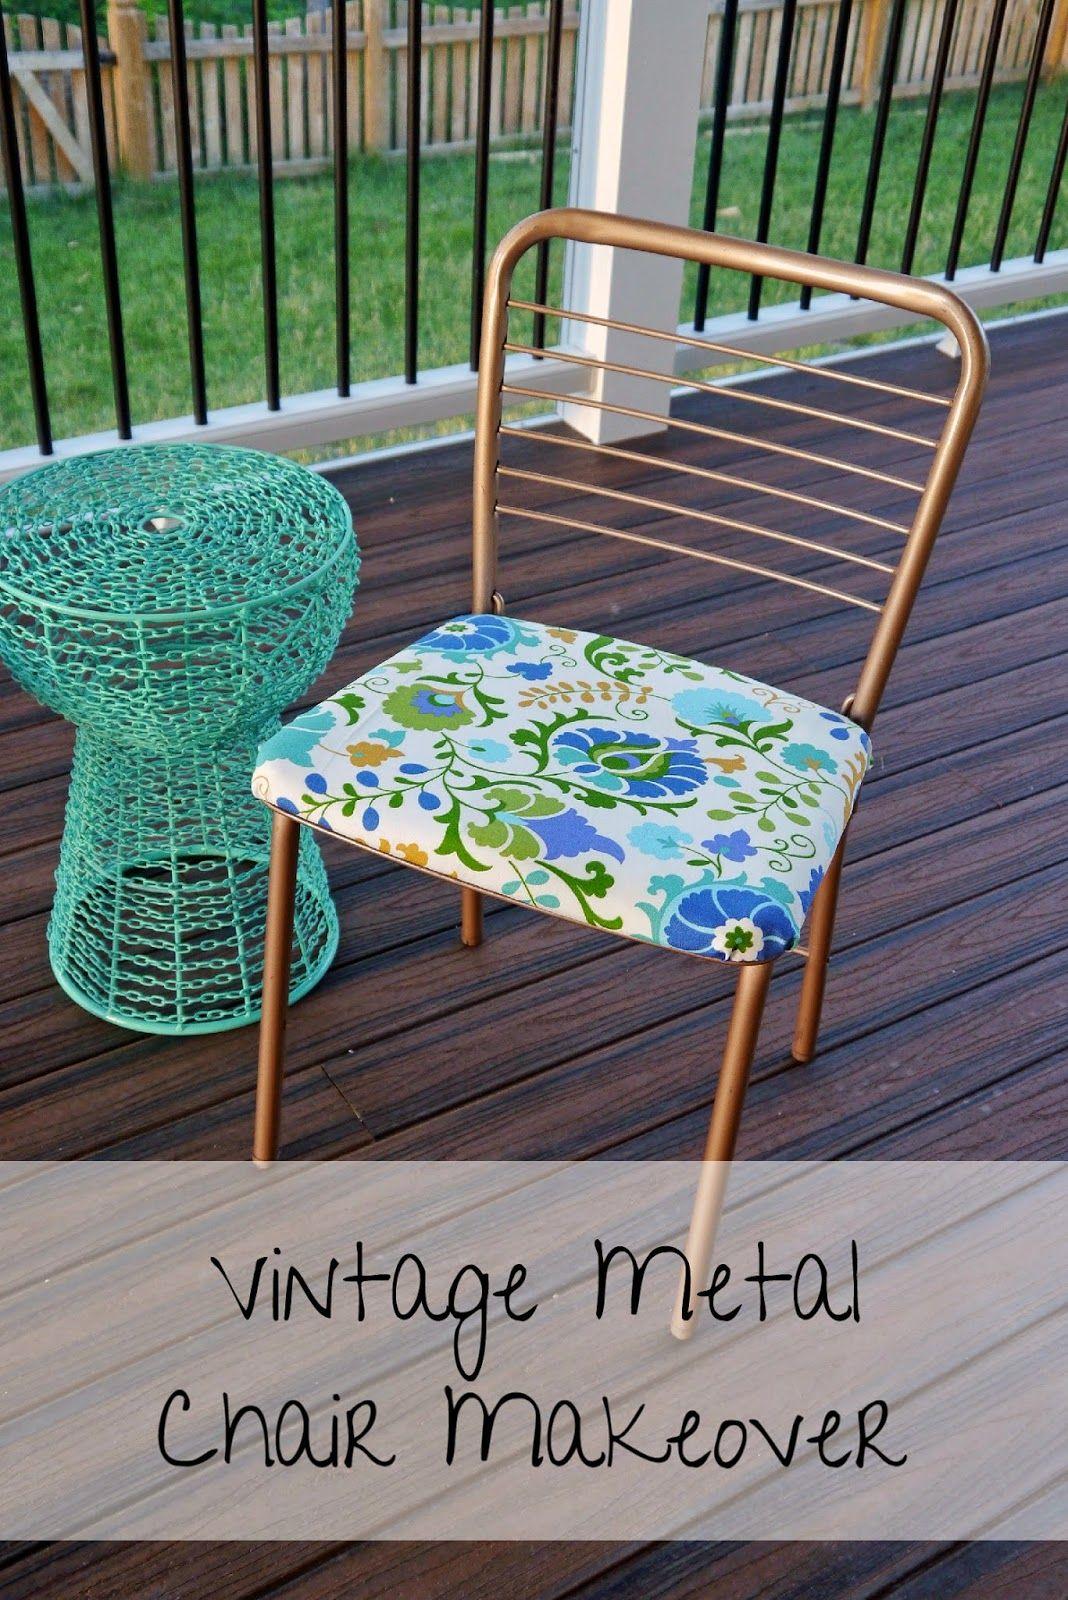 Strawberry Jam House: Vintage Metal Chair Makeover  Vintage metal